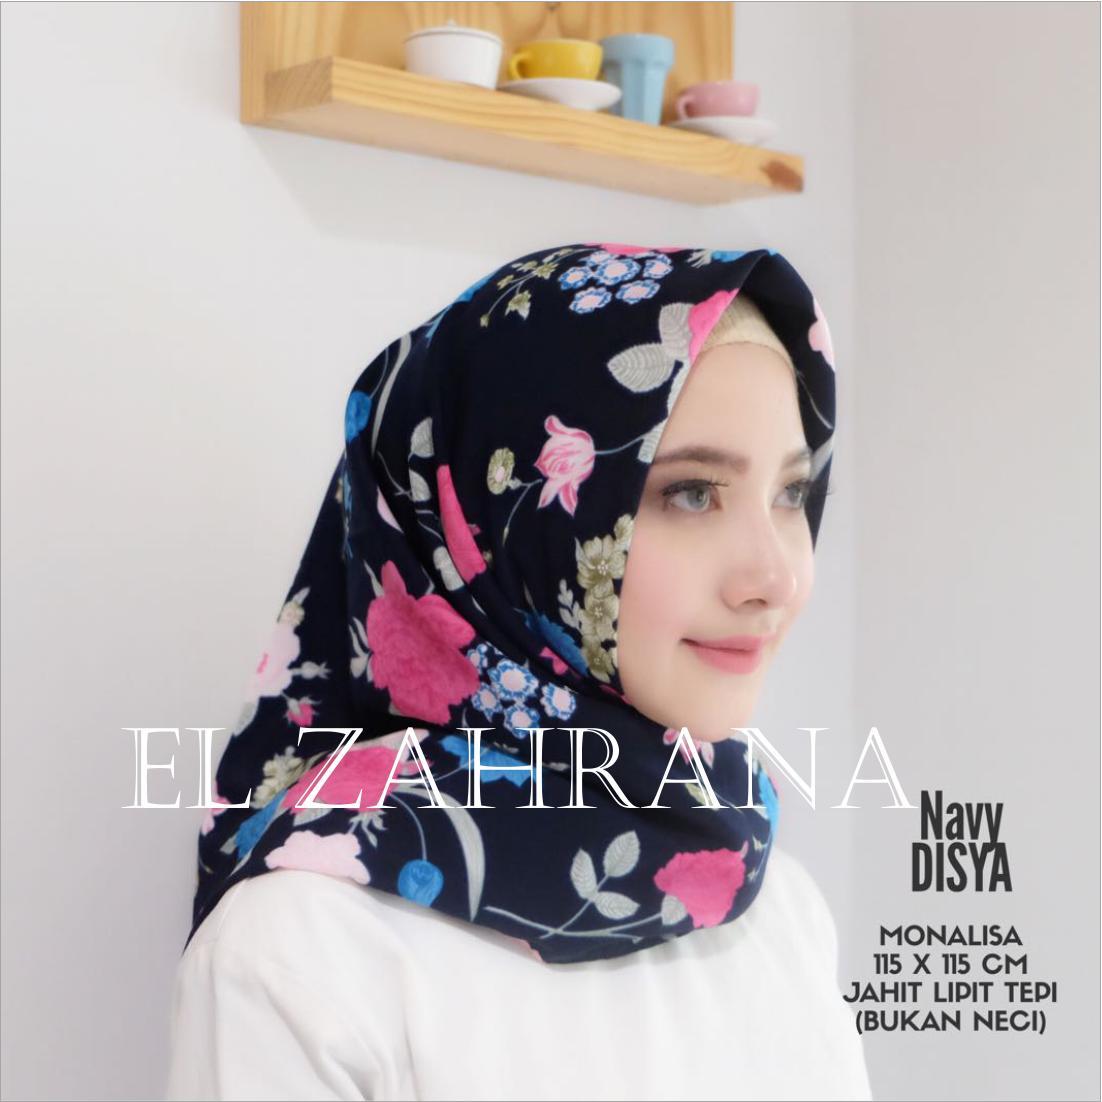 Cuci Gudang El Zahrana Hijab Kerudung Segi Empat Jilbab Motif Premium Monalisa